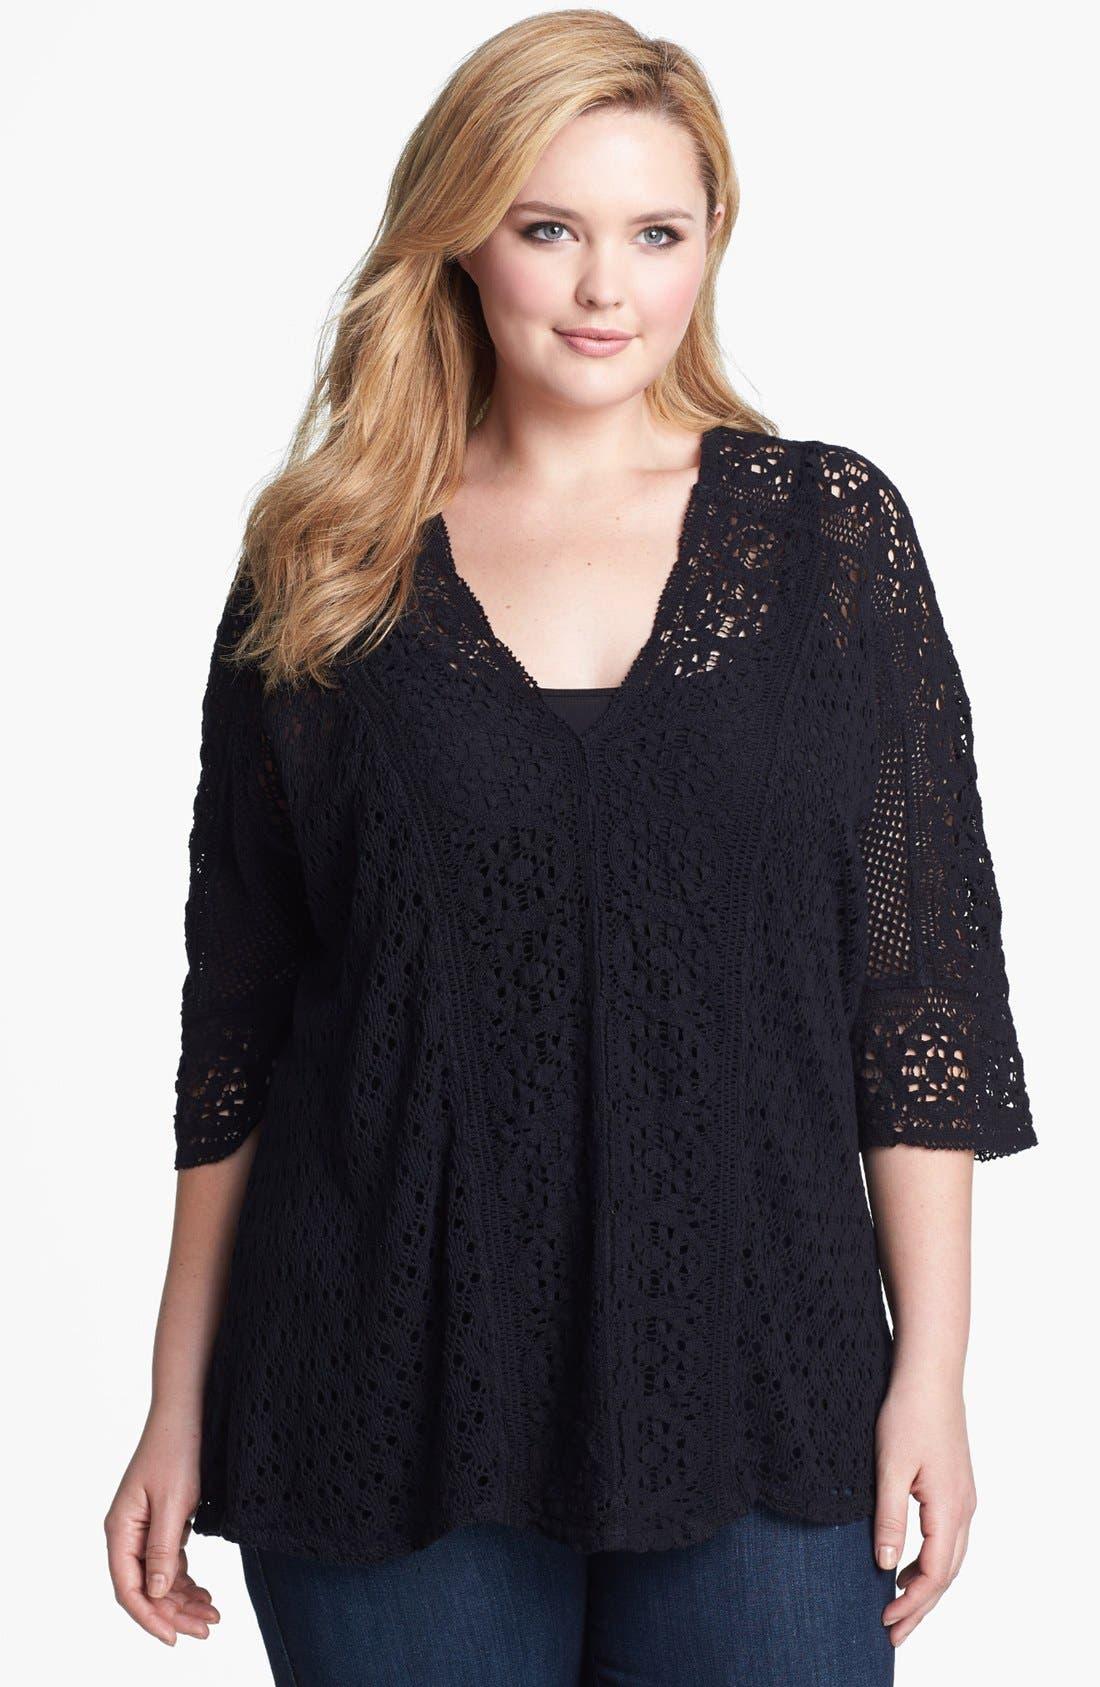 Alternate Image 1 Selected - XCVI Wearables Crochet Lace Tunic (Plus Size)